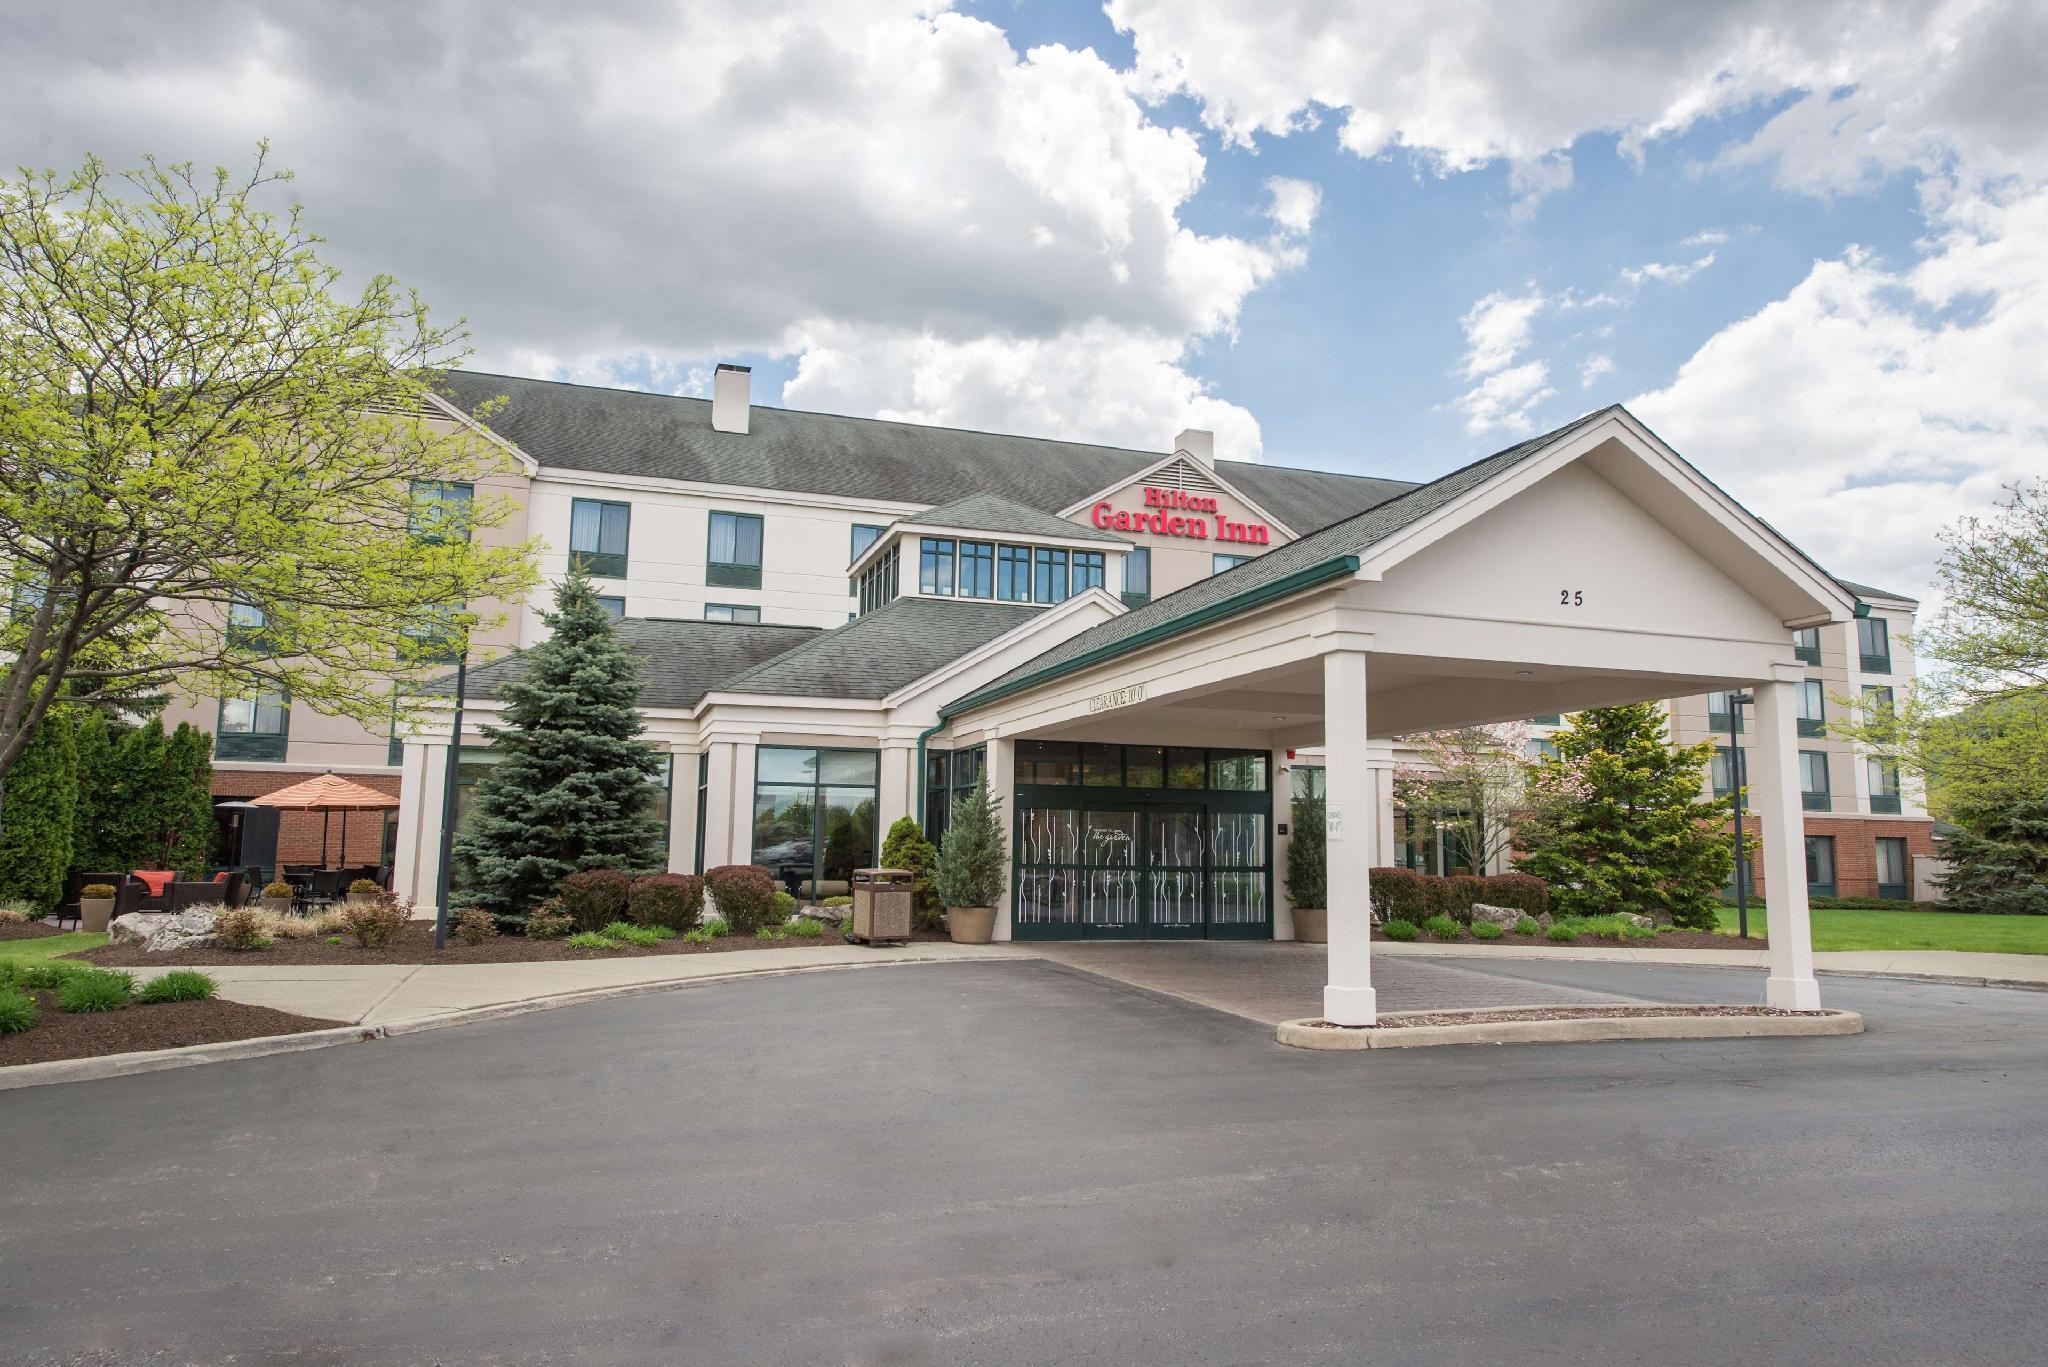 Hilton Garden Inn Poughkeepsie Fishkill